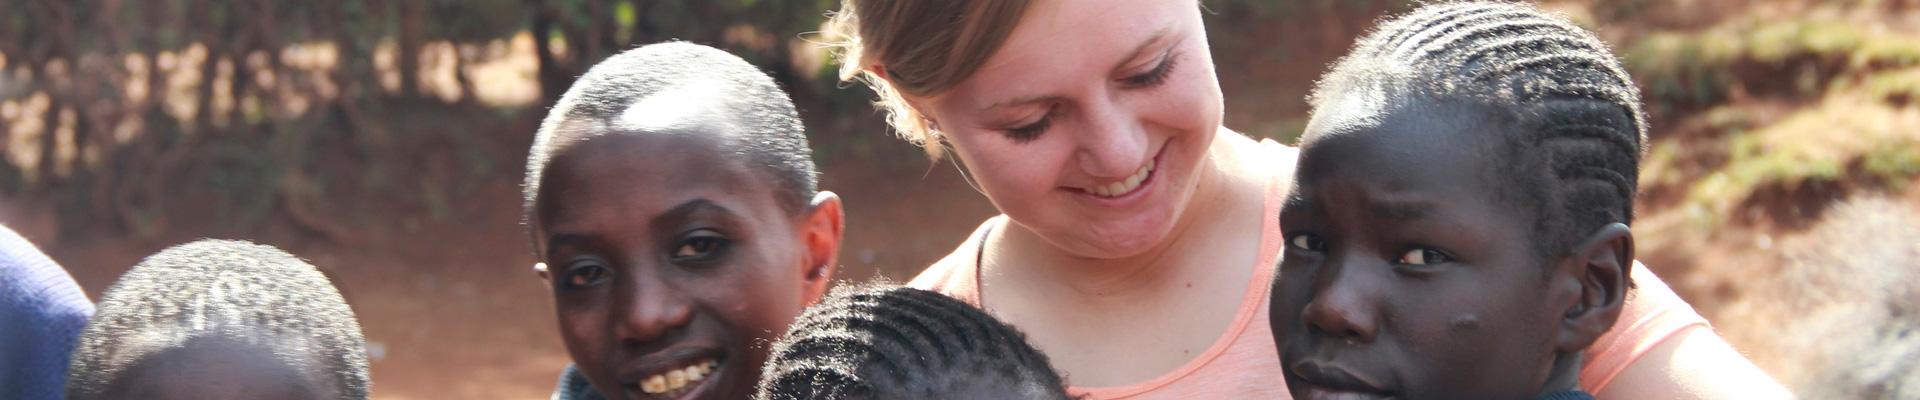 Healthcare Volunteer Abroad - Nairobi, Kenya   HIV / AIDS